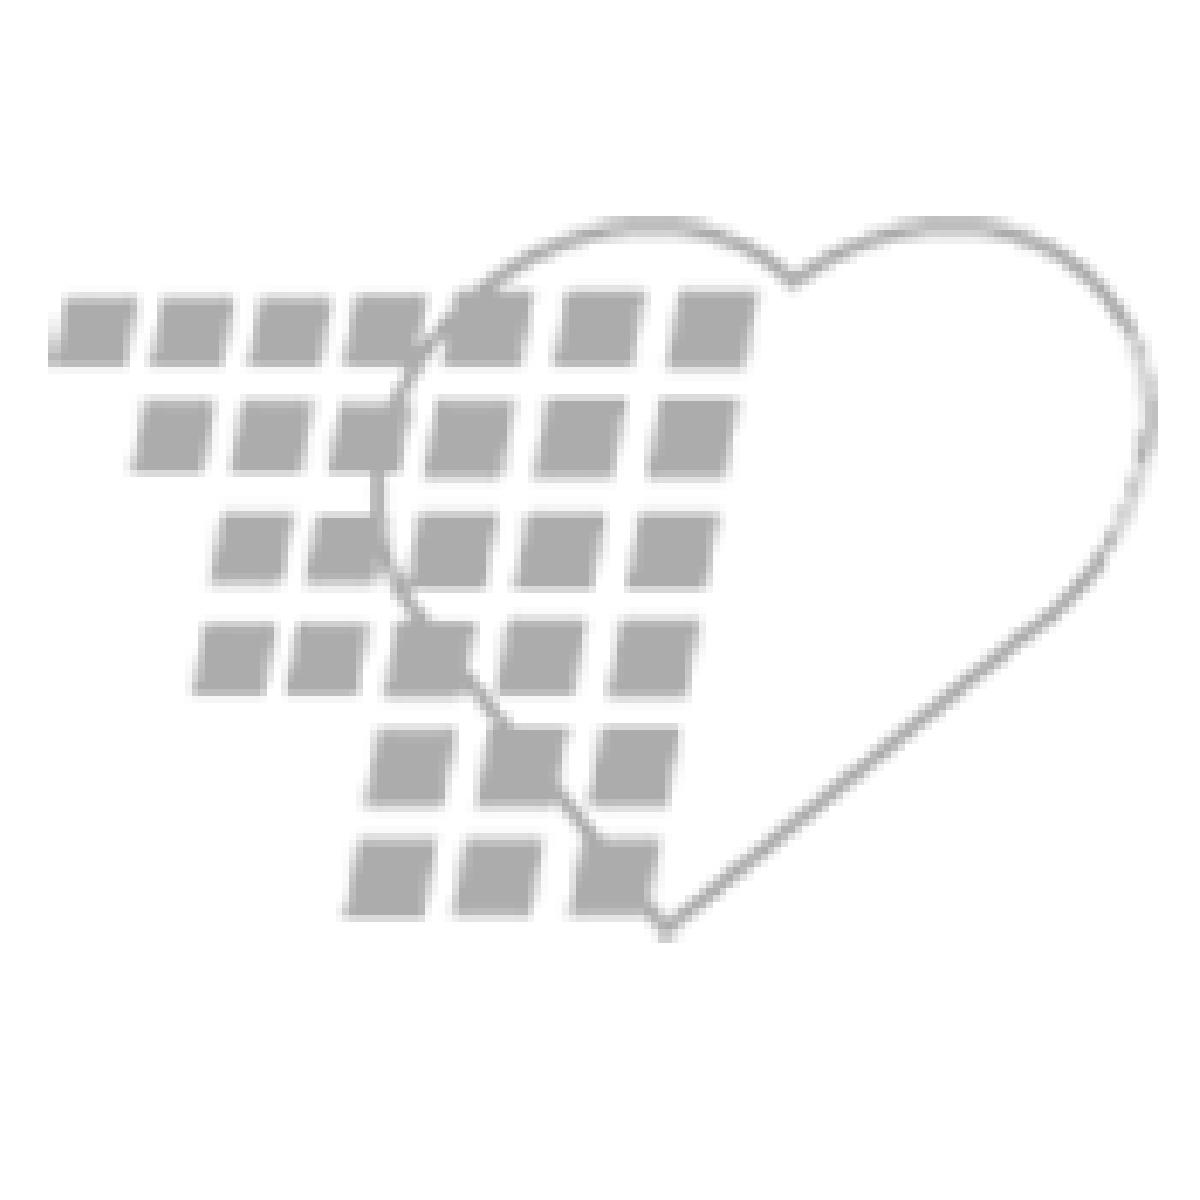 "06-82-0225 - Multi-Sample Needle (Black) 22G x 1 1/2"" 100/Bx"